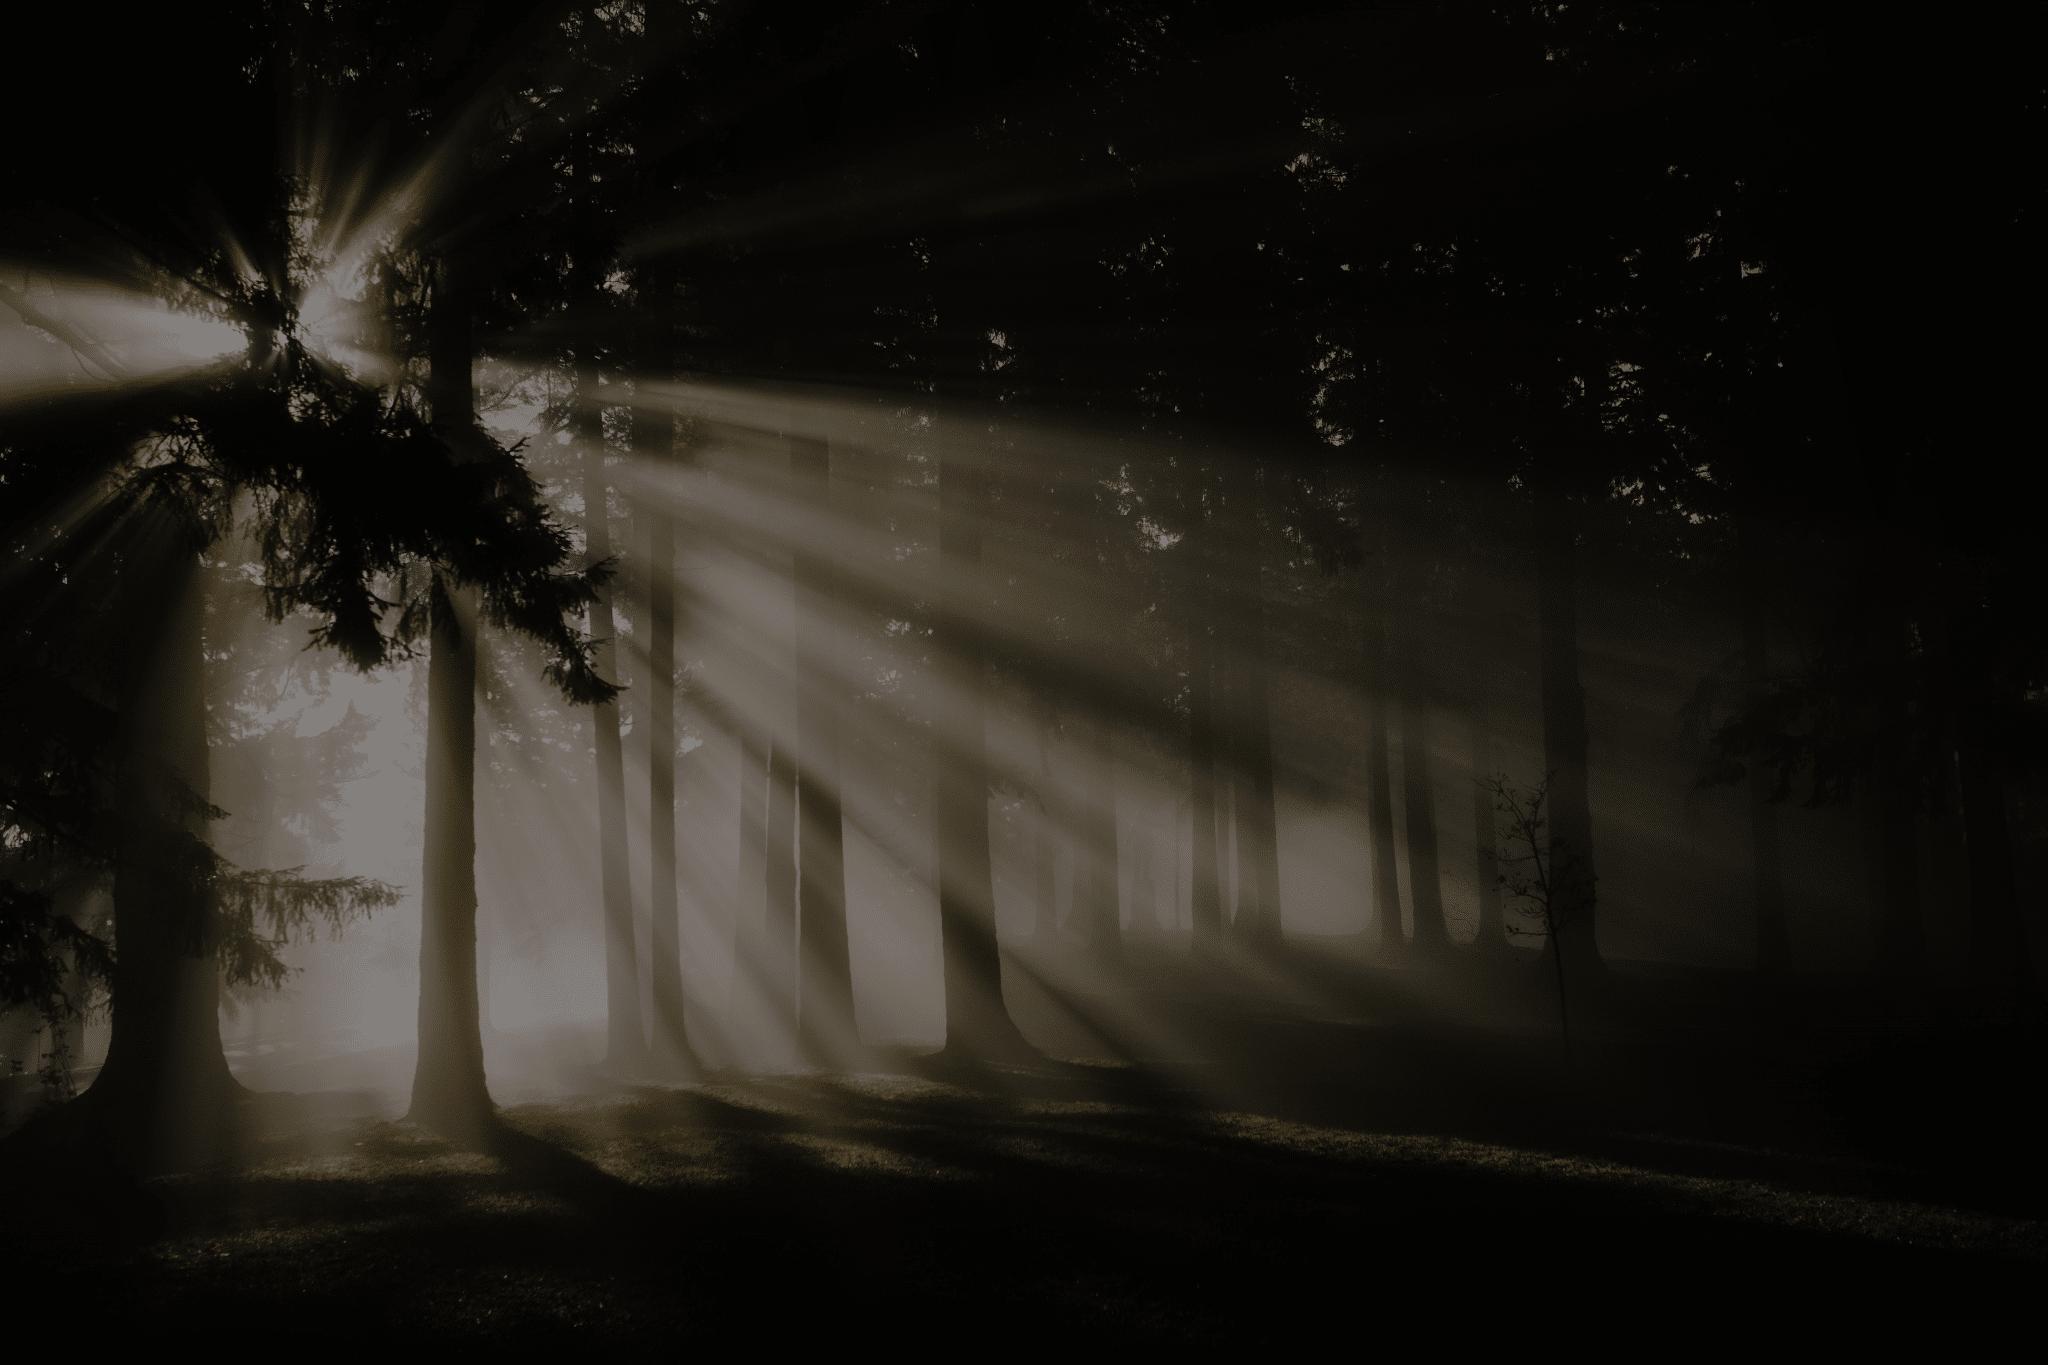 light shining through a forest